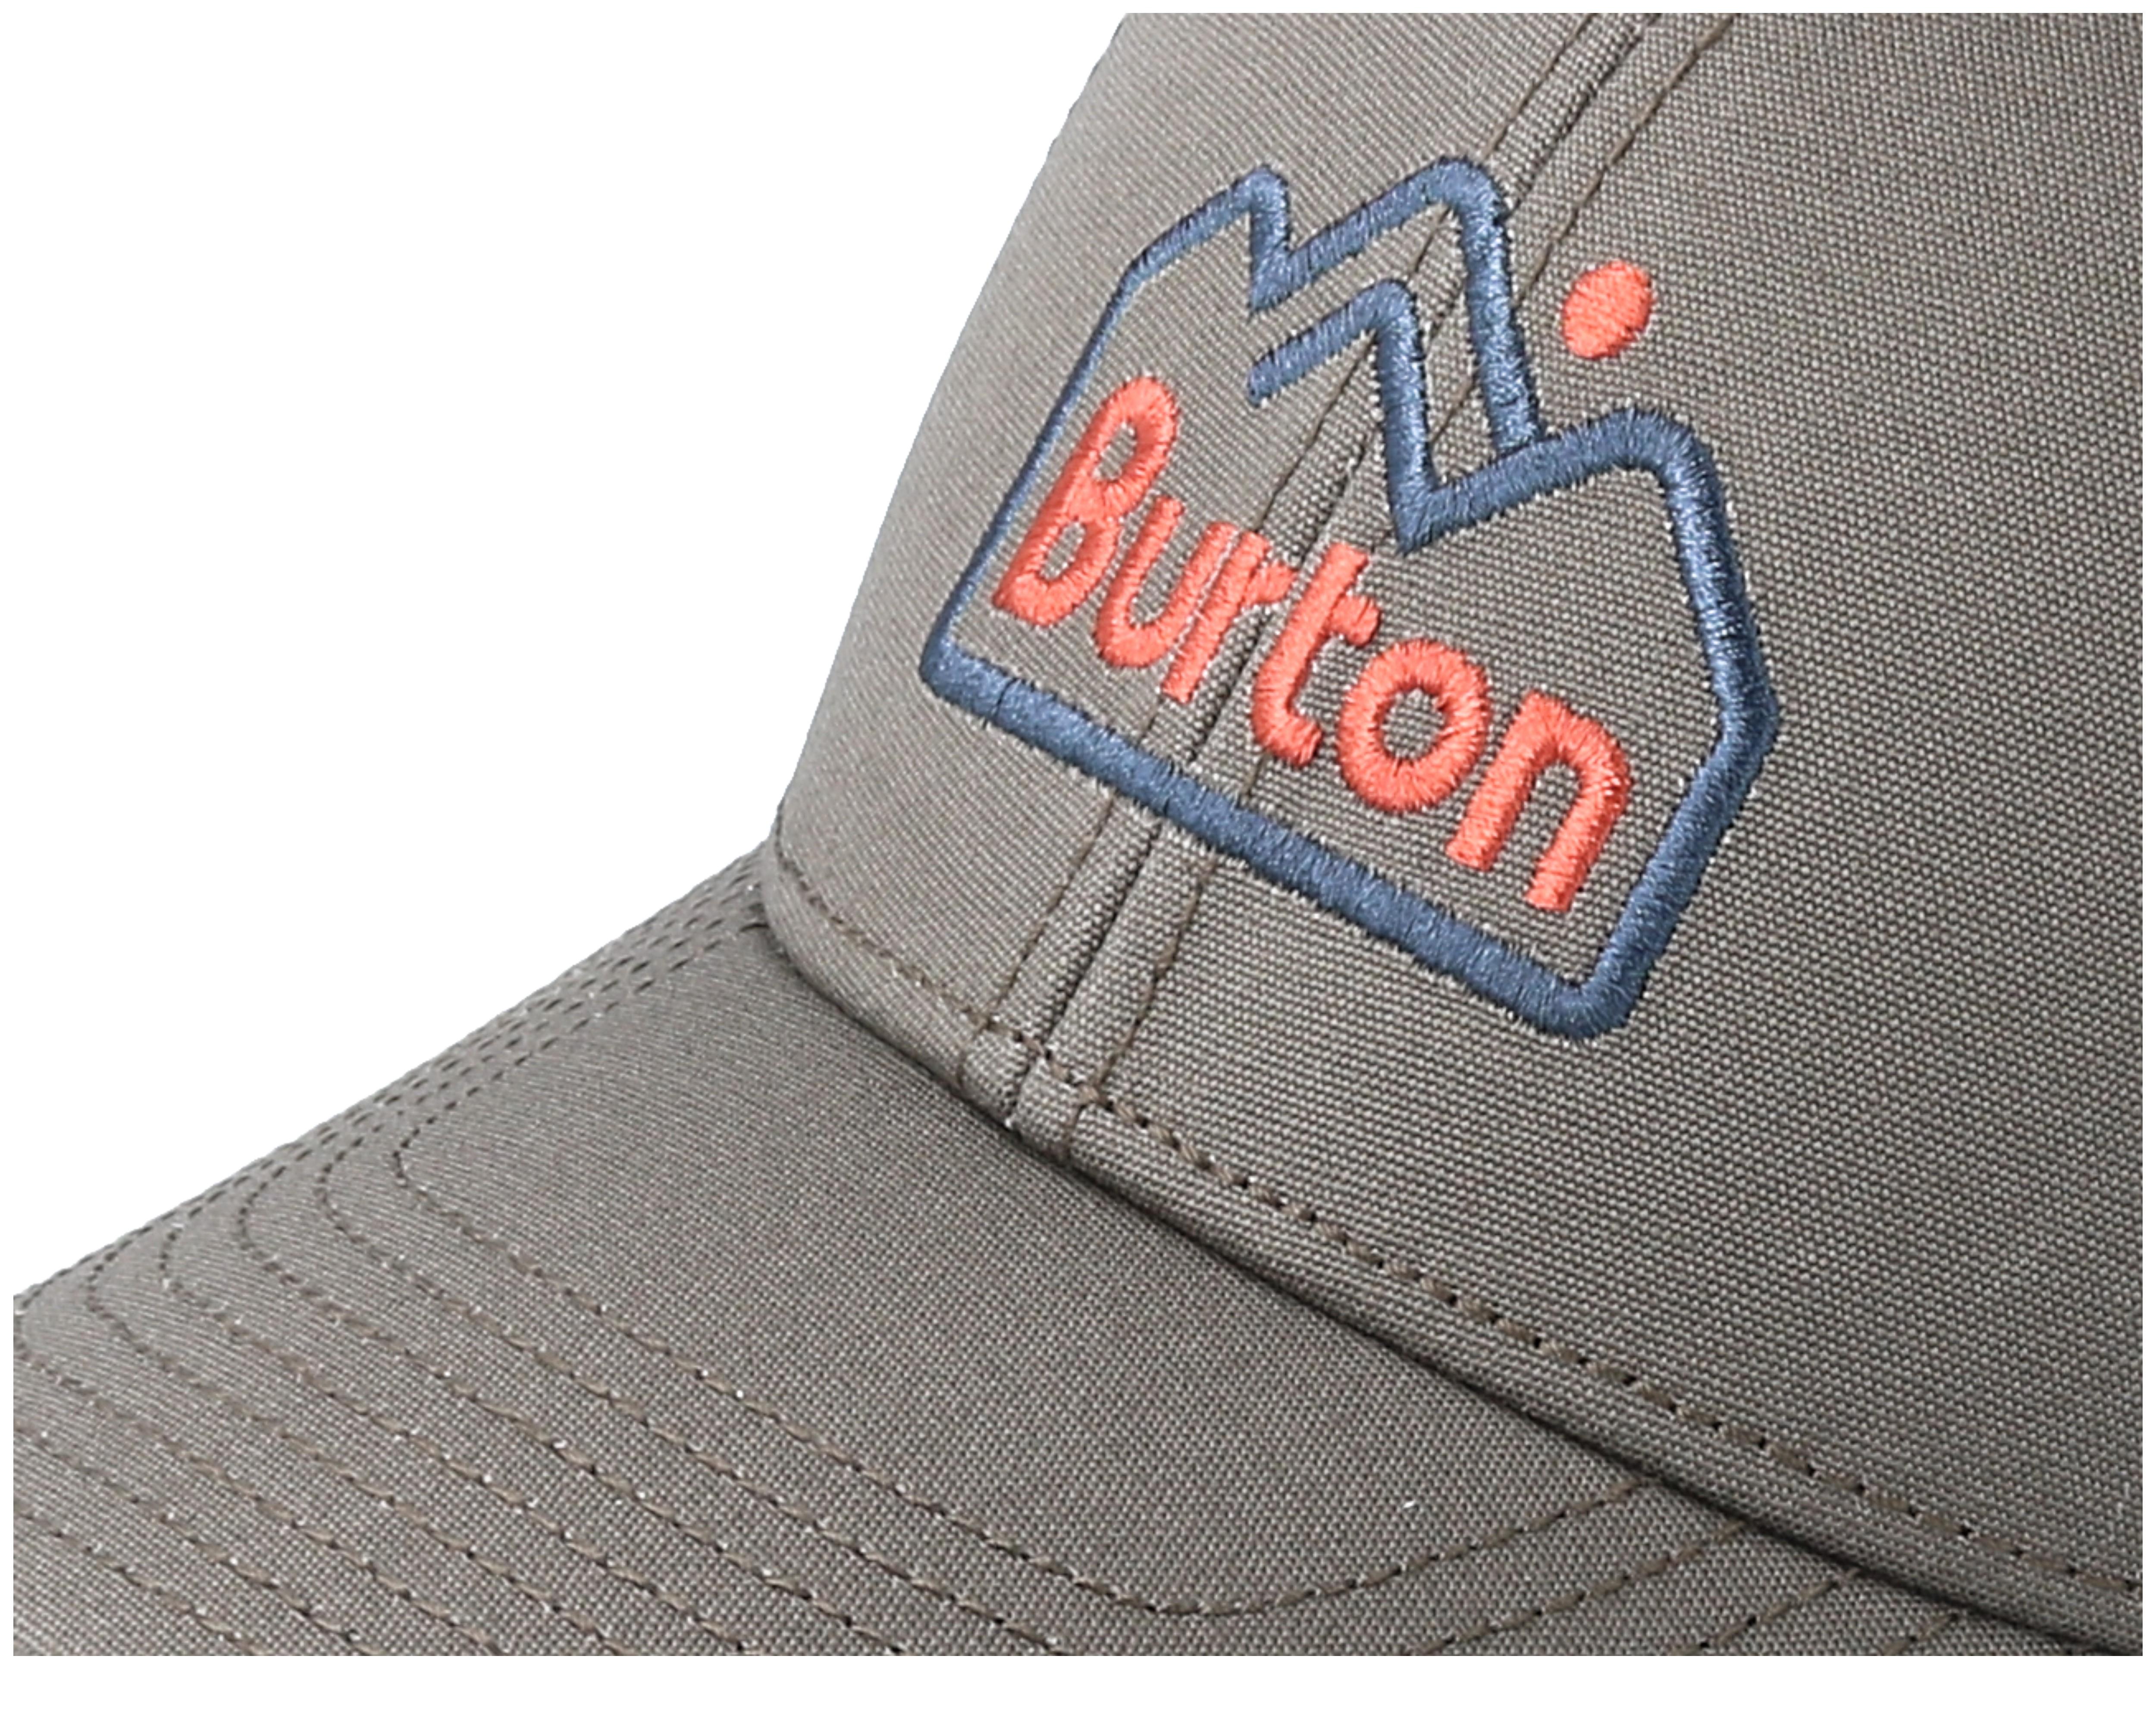 Citaten Seneca Fakta : Treehopper seneca rock trucker burton keps hatstore